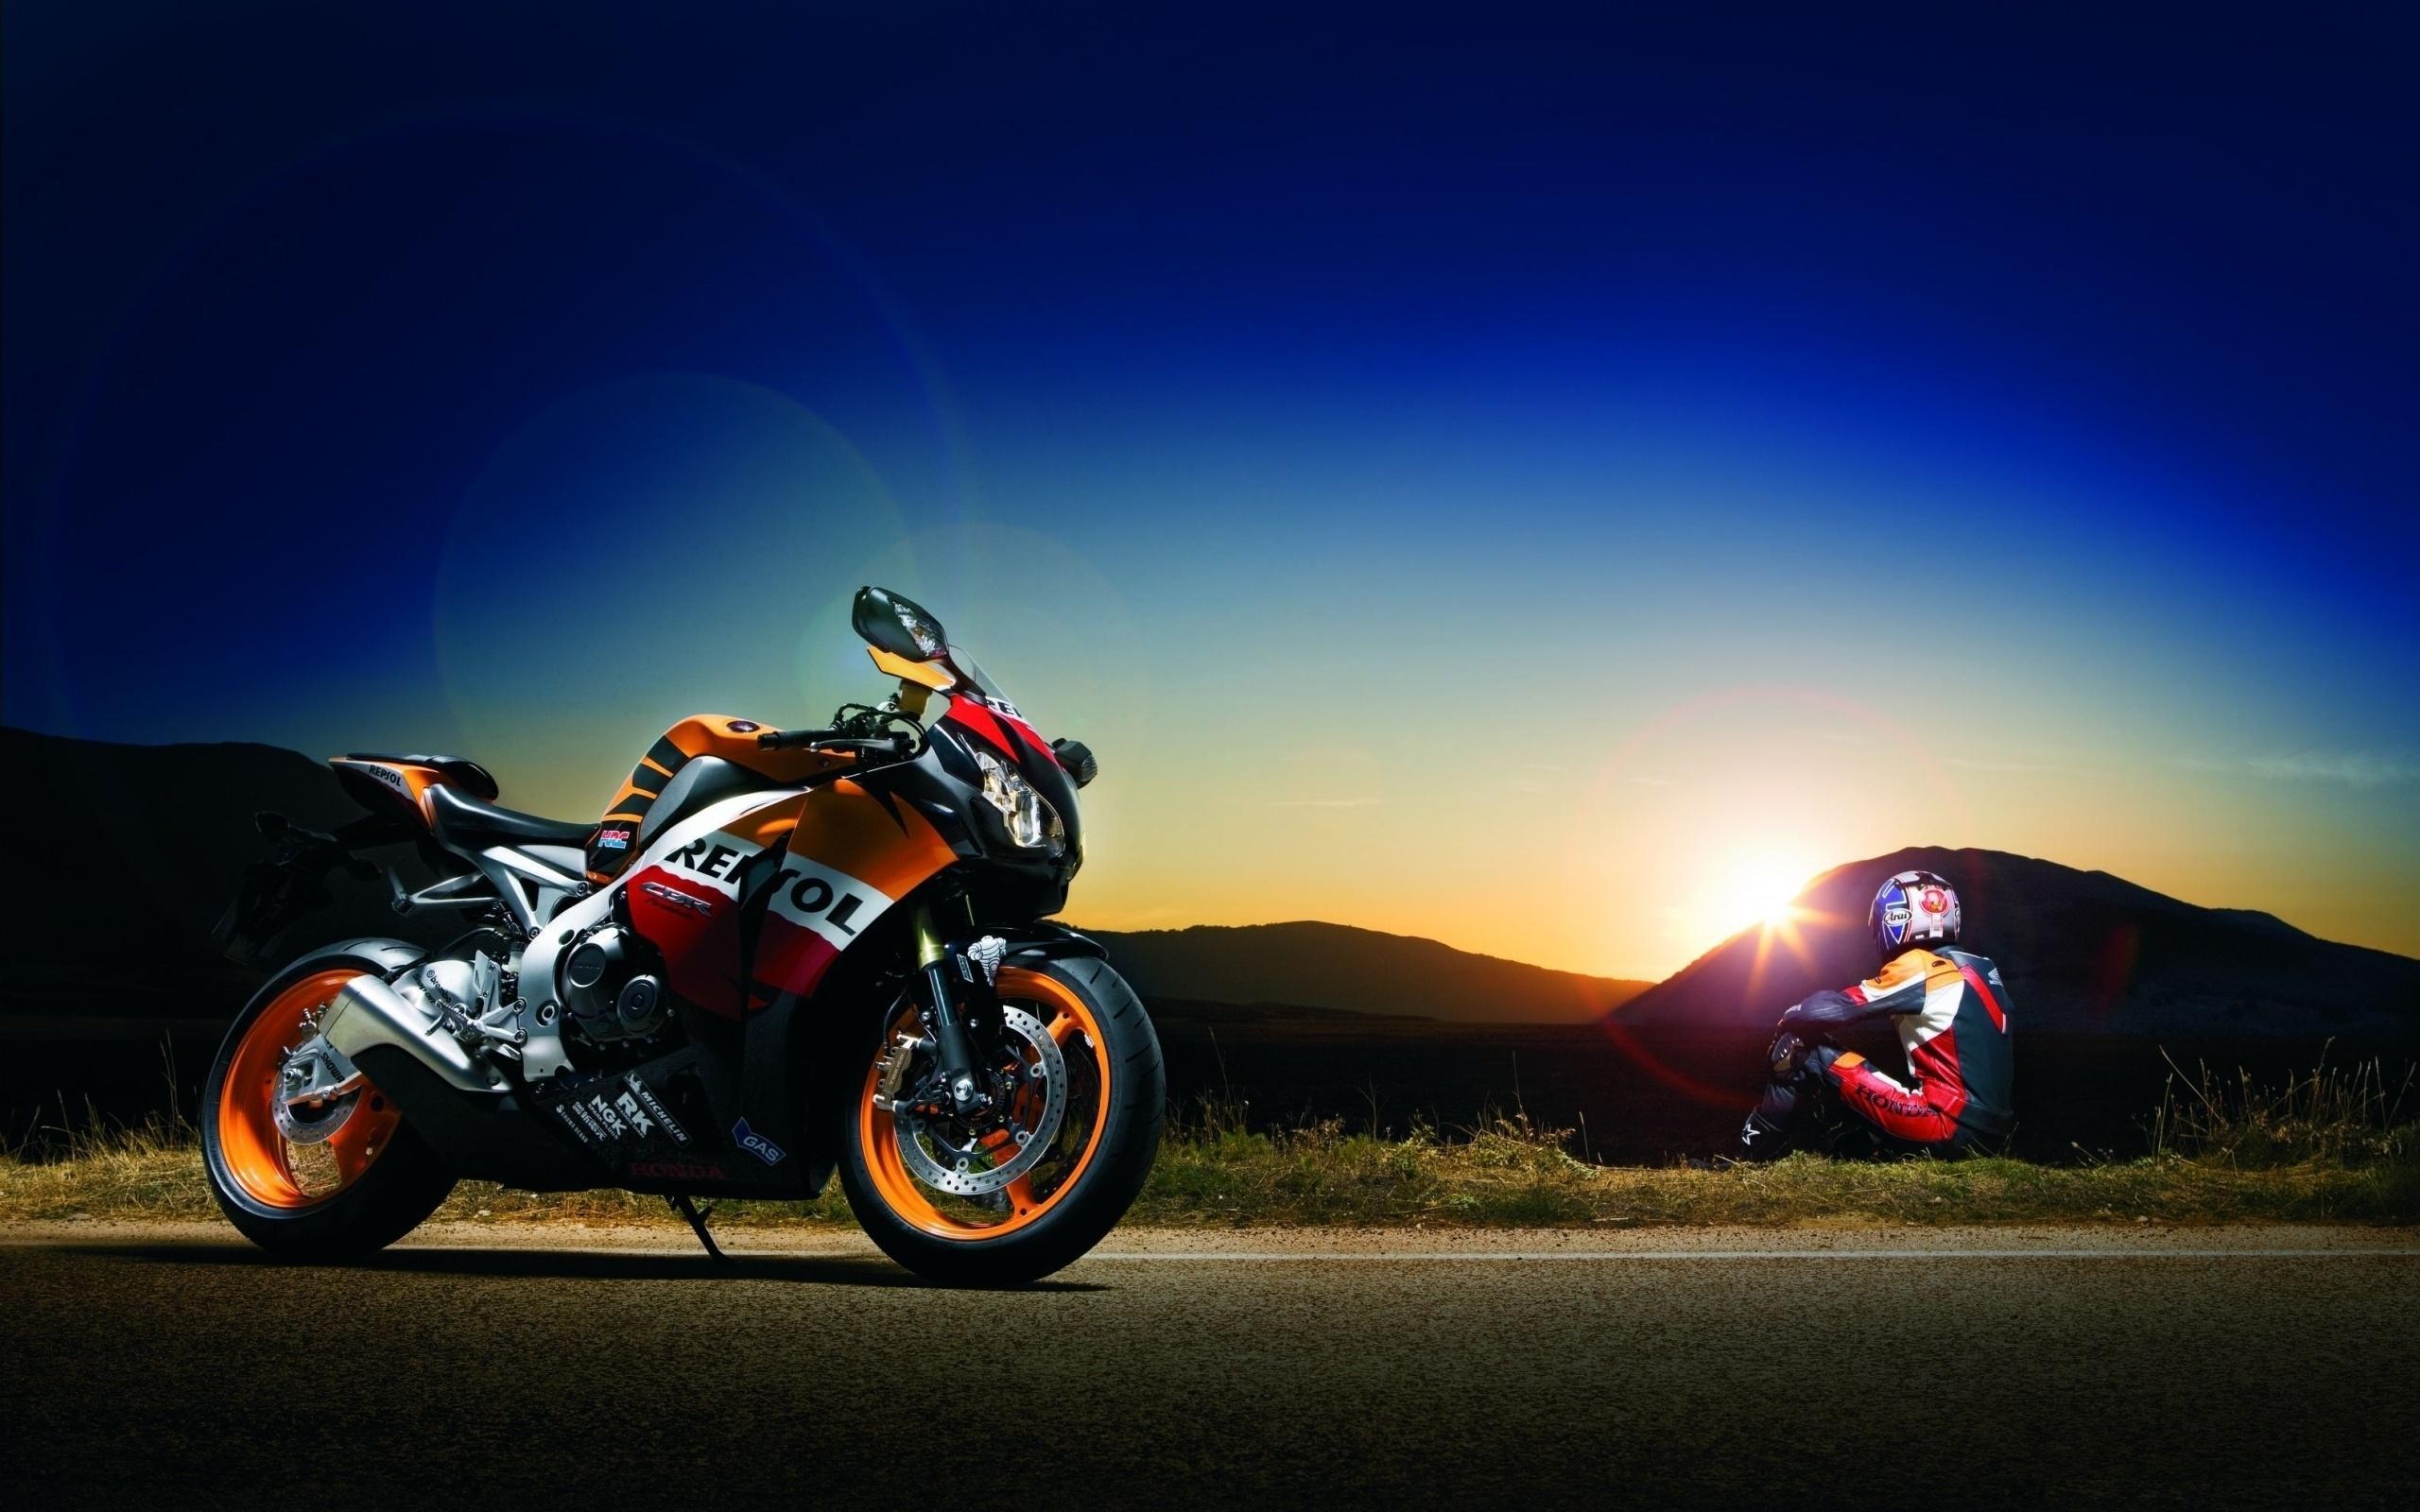 Motorcycle Wallpaper 14 2560x1600 768x480